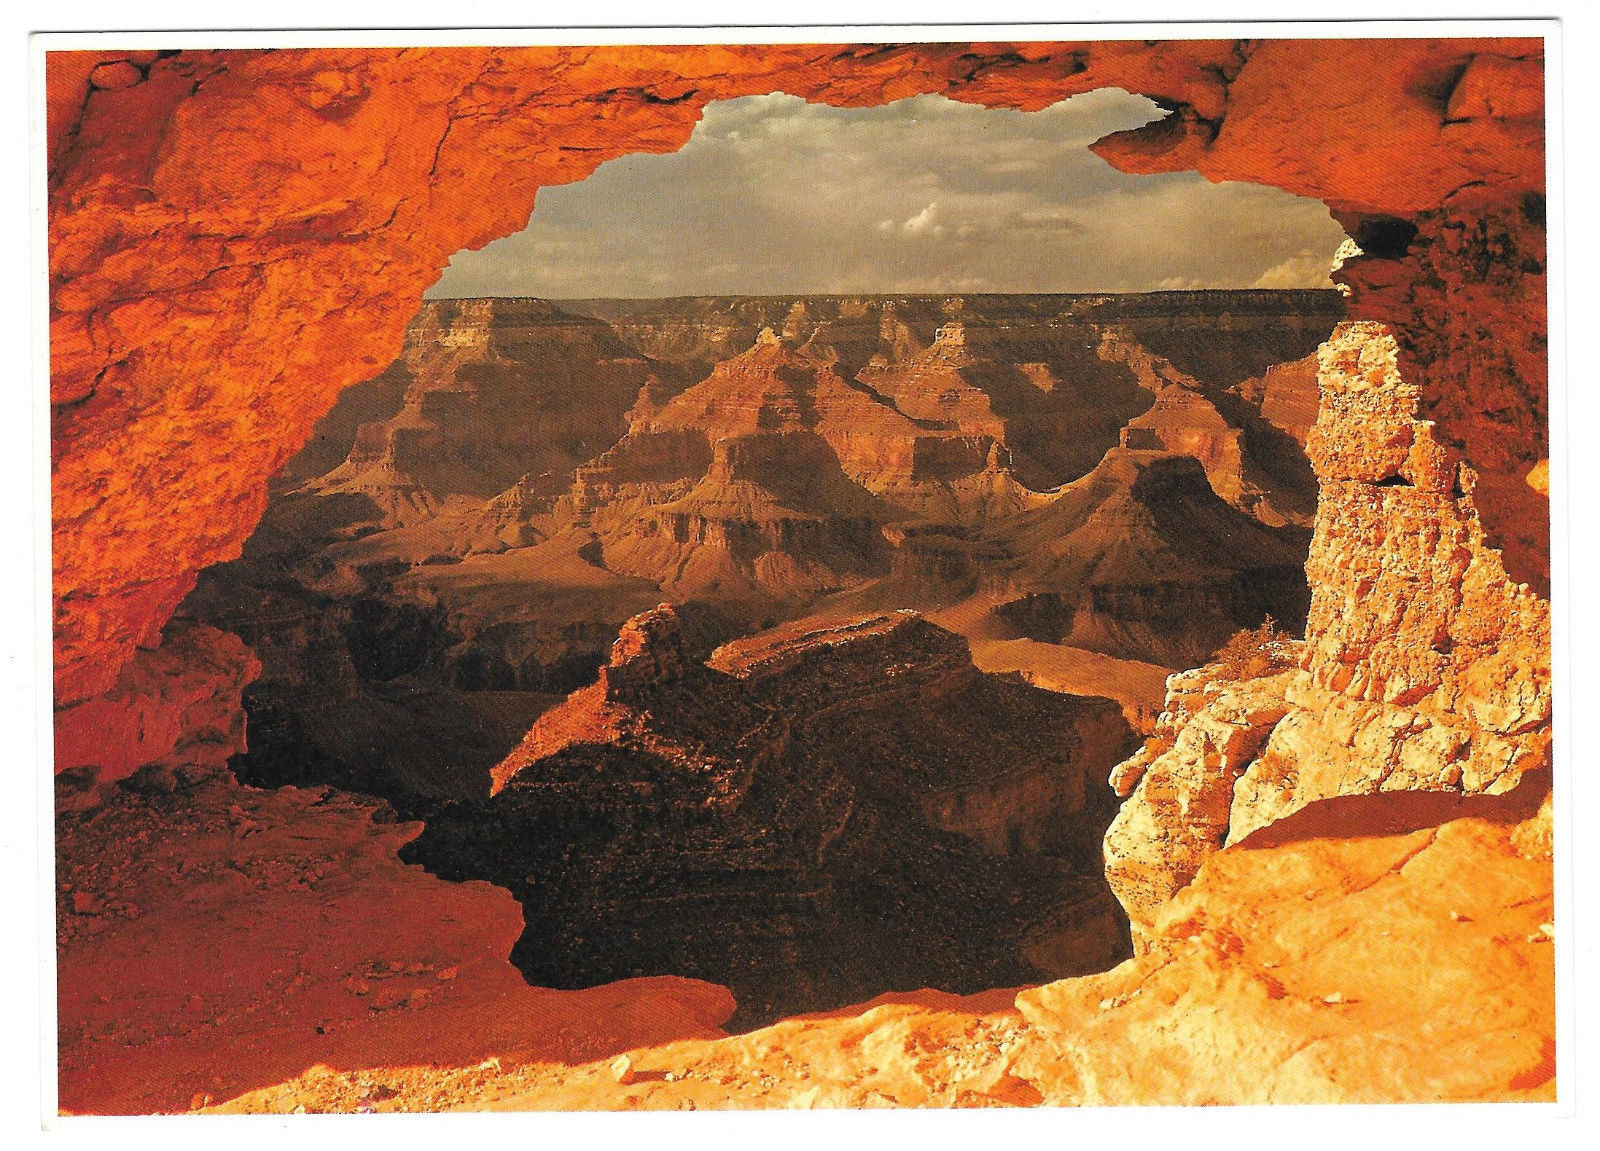 Grand Canyon Impact Photo Print John Wagner Collection David Muench 5 X 7